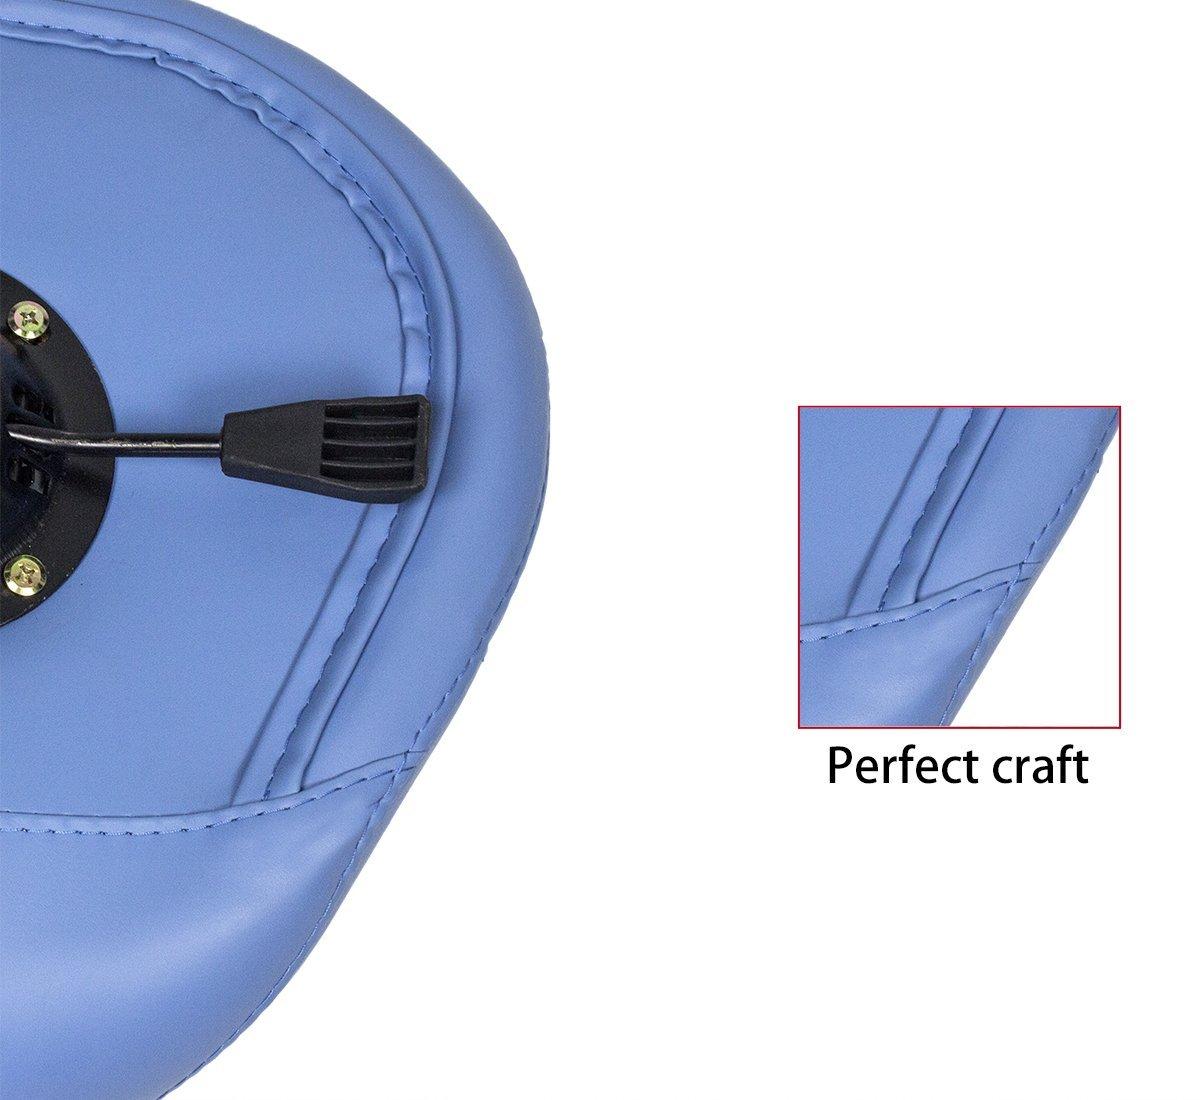 Antlu Saddle Stool Rolling Ergonomic Swivel Chair, for Drafting Massage Clinic Spa Salon,Adjustable Hydraulic with Wheels (Blue) by Antlu (Image #7)